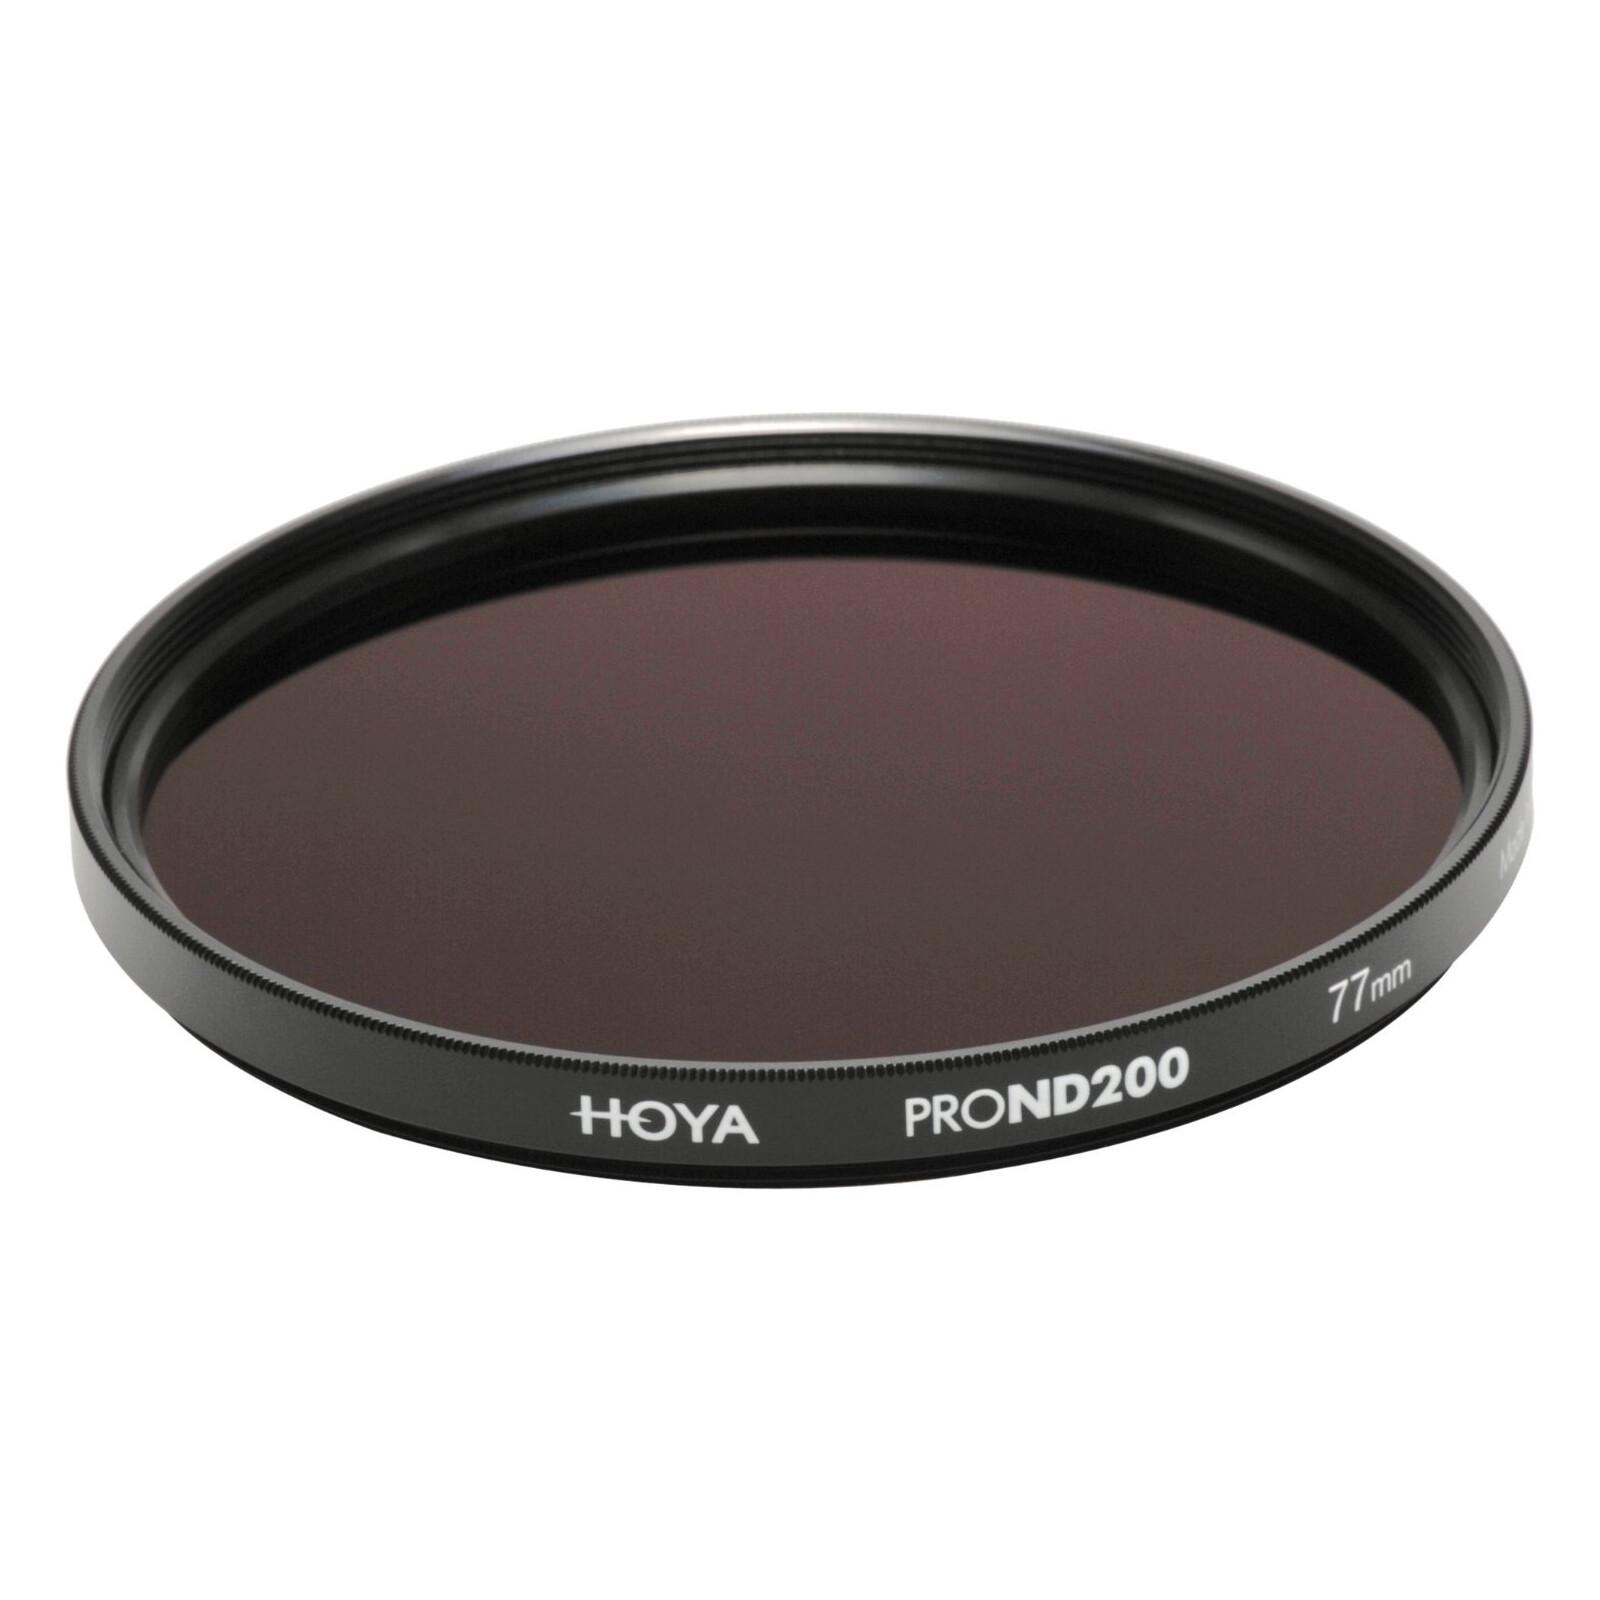 Hoya Grau PRO ND 200 72mm